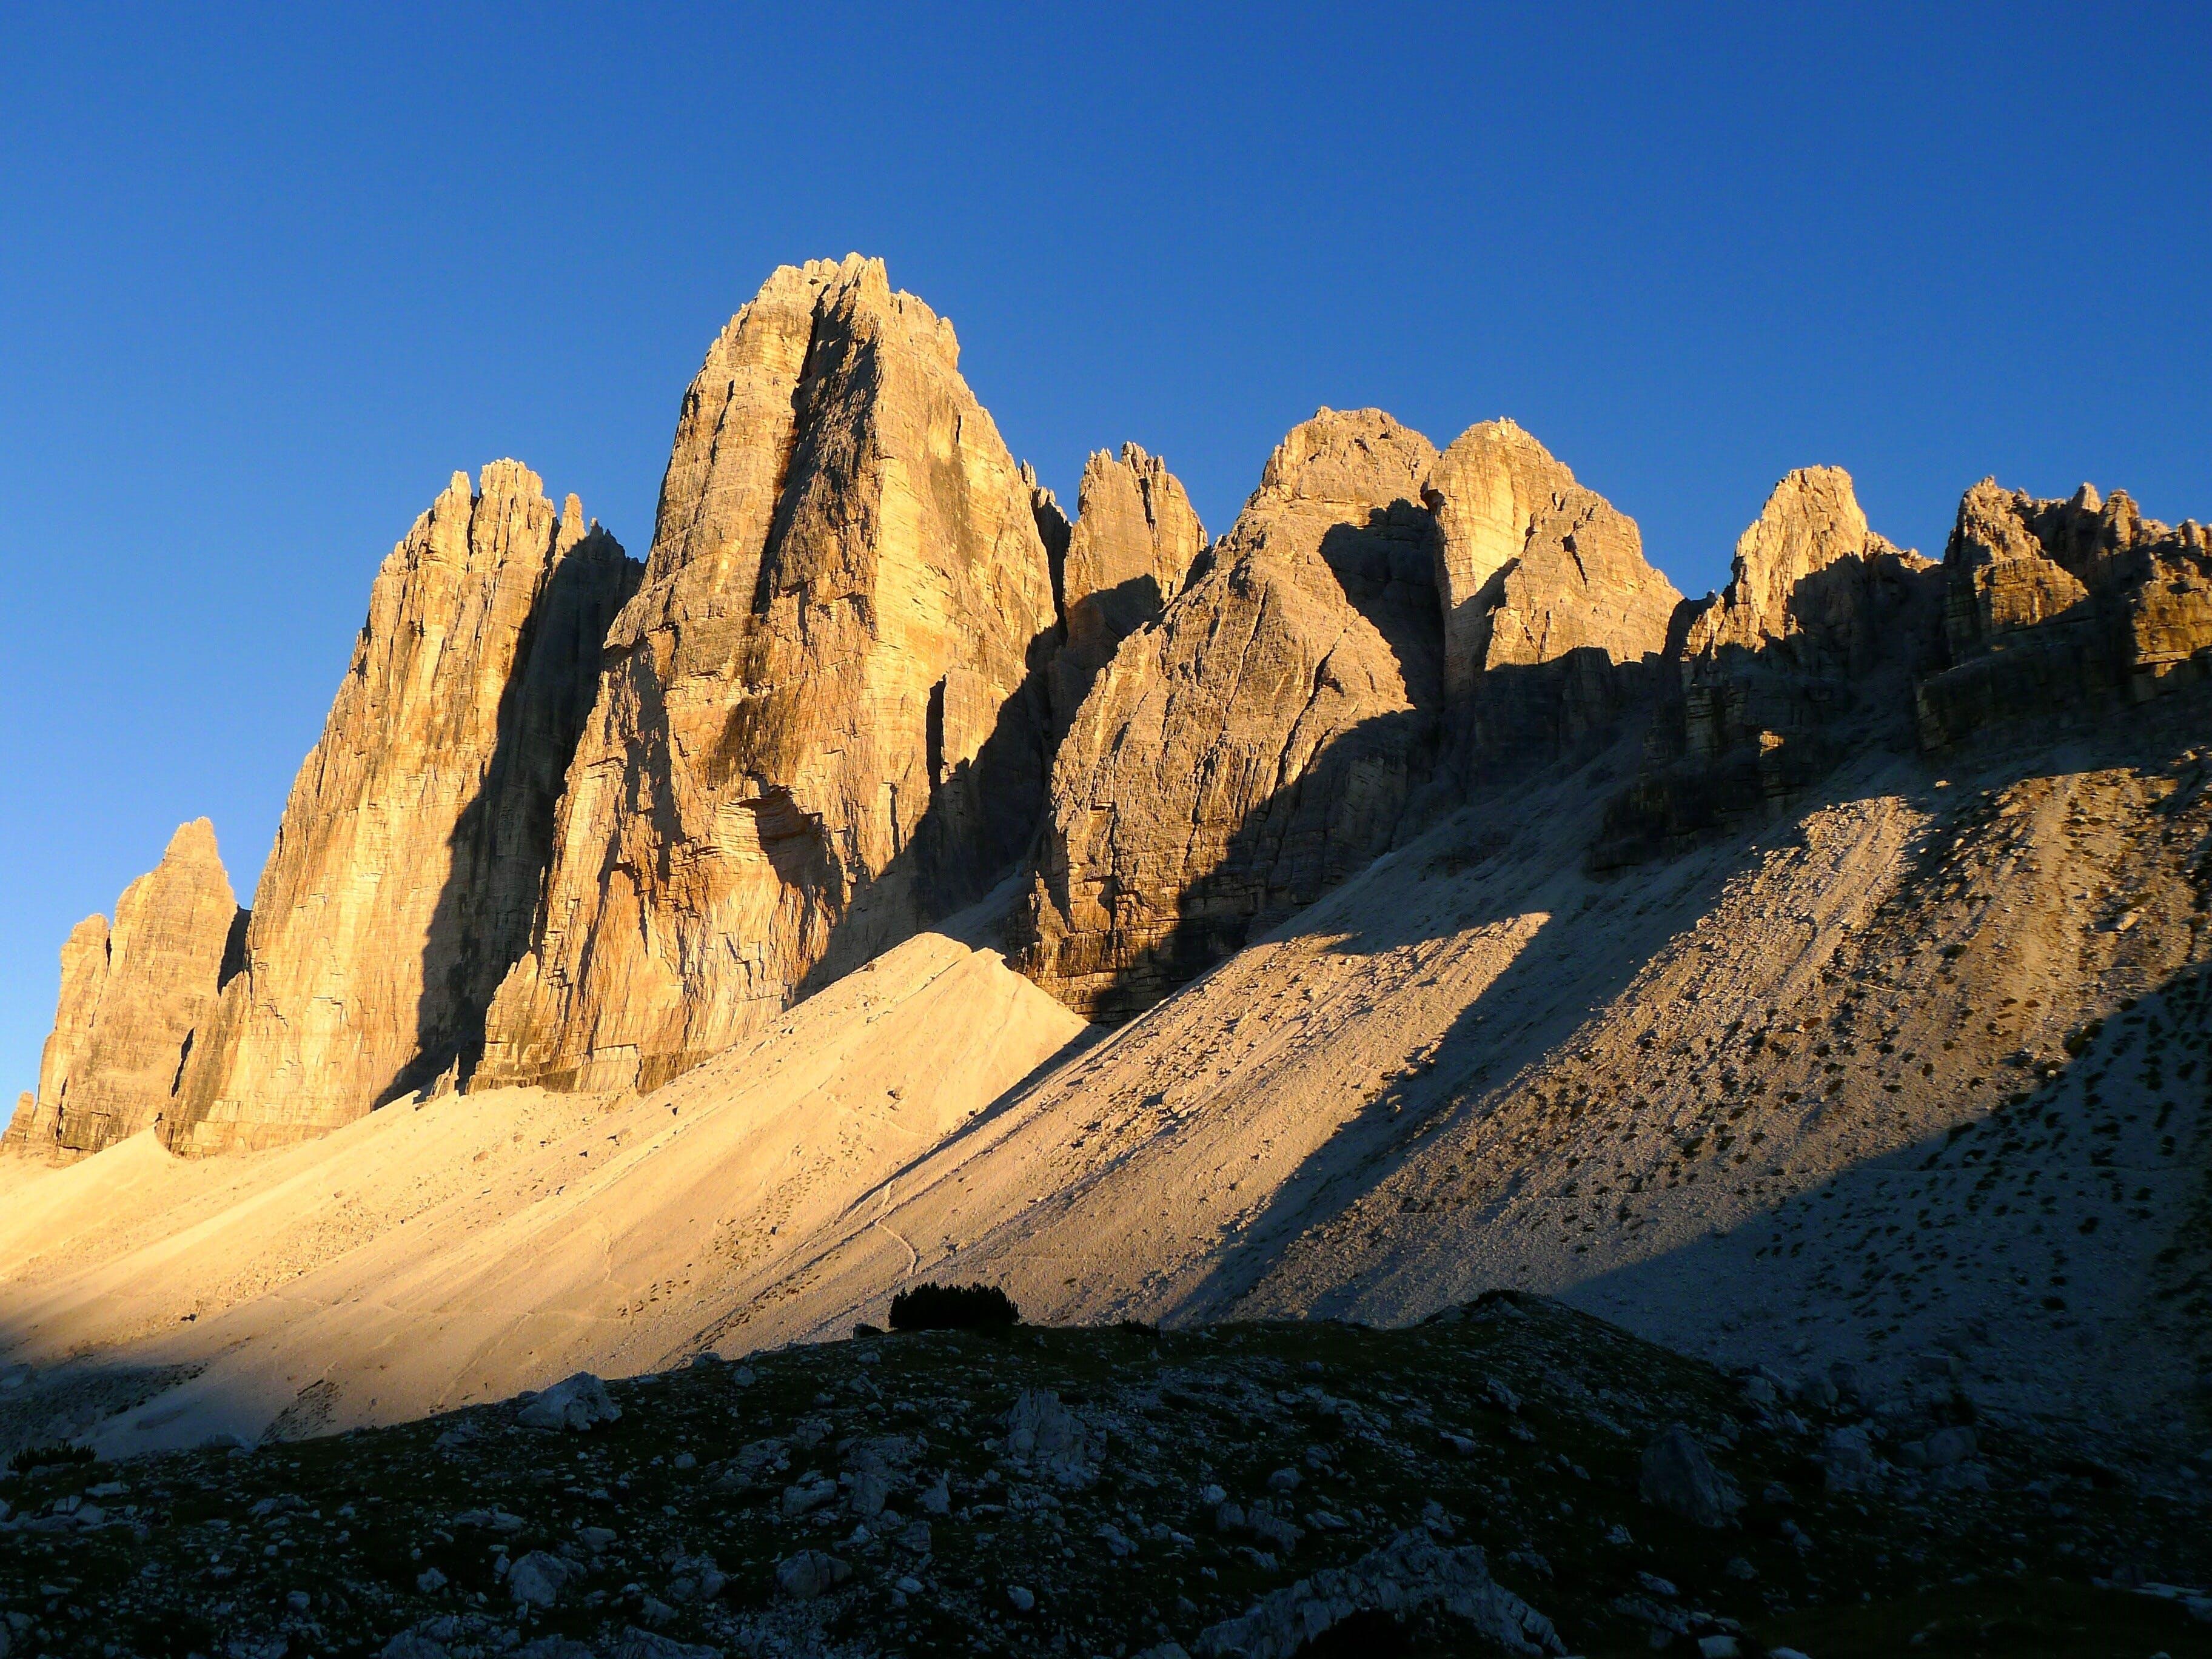 Free stock photo of mountains, nature, dolomites, abendstimmung